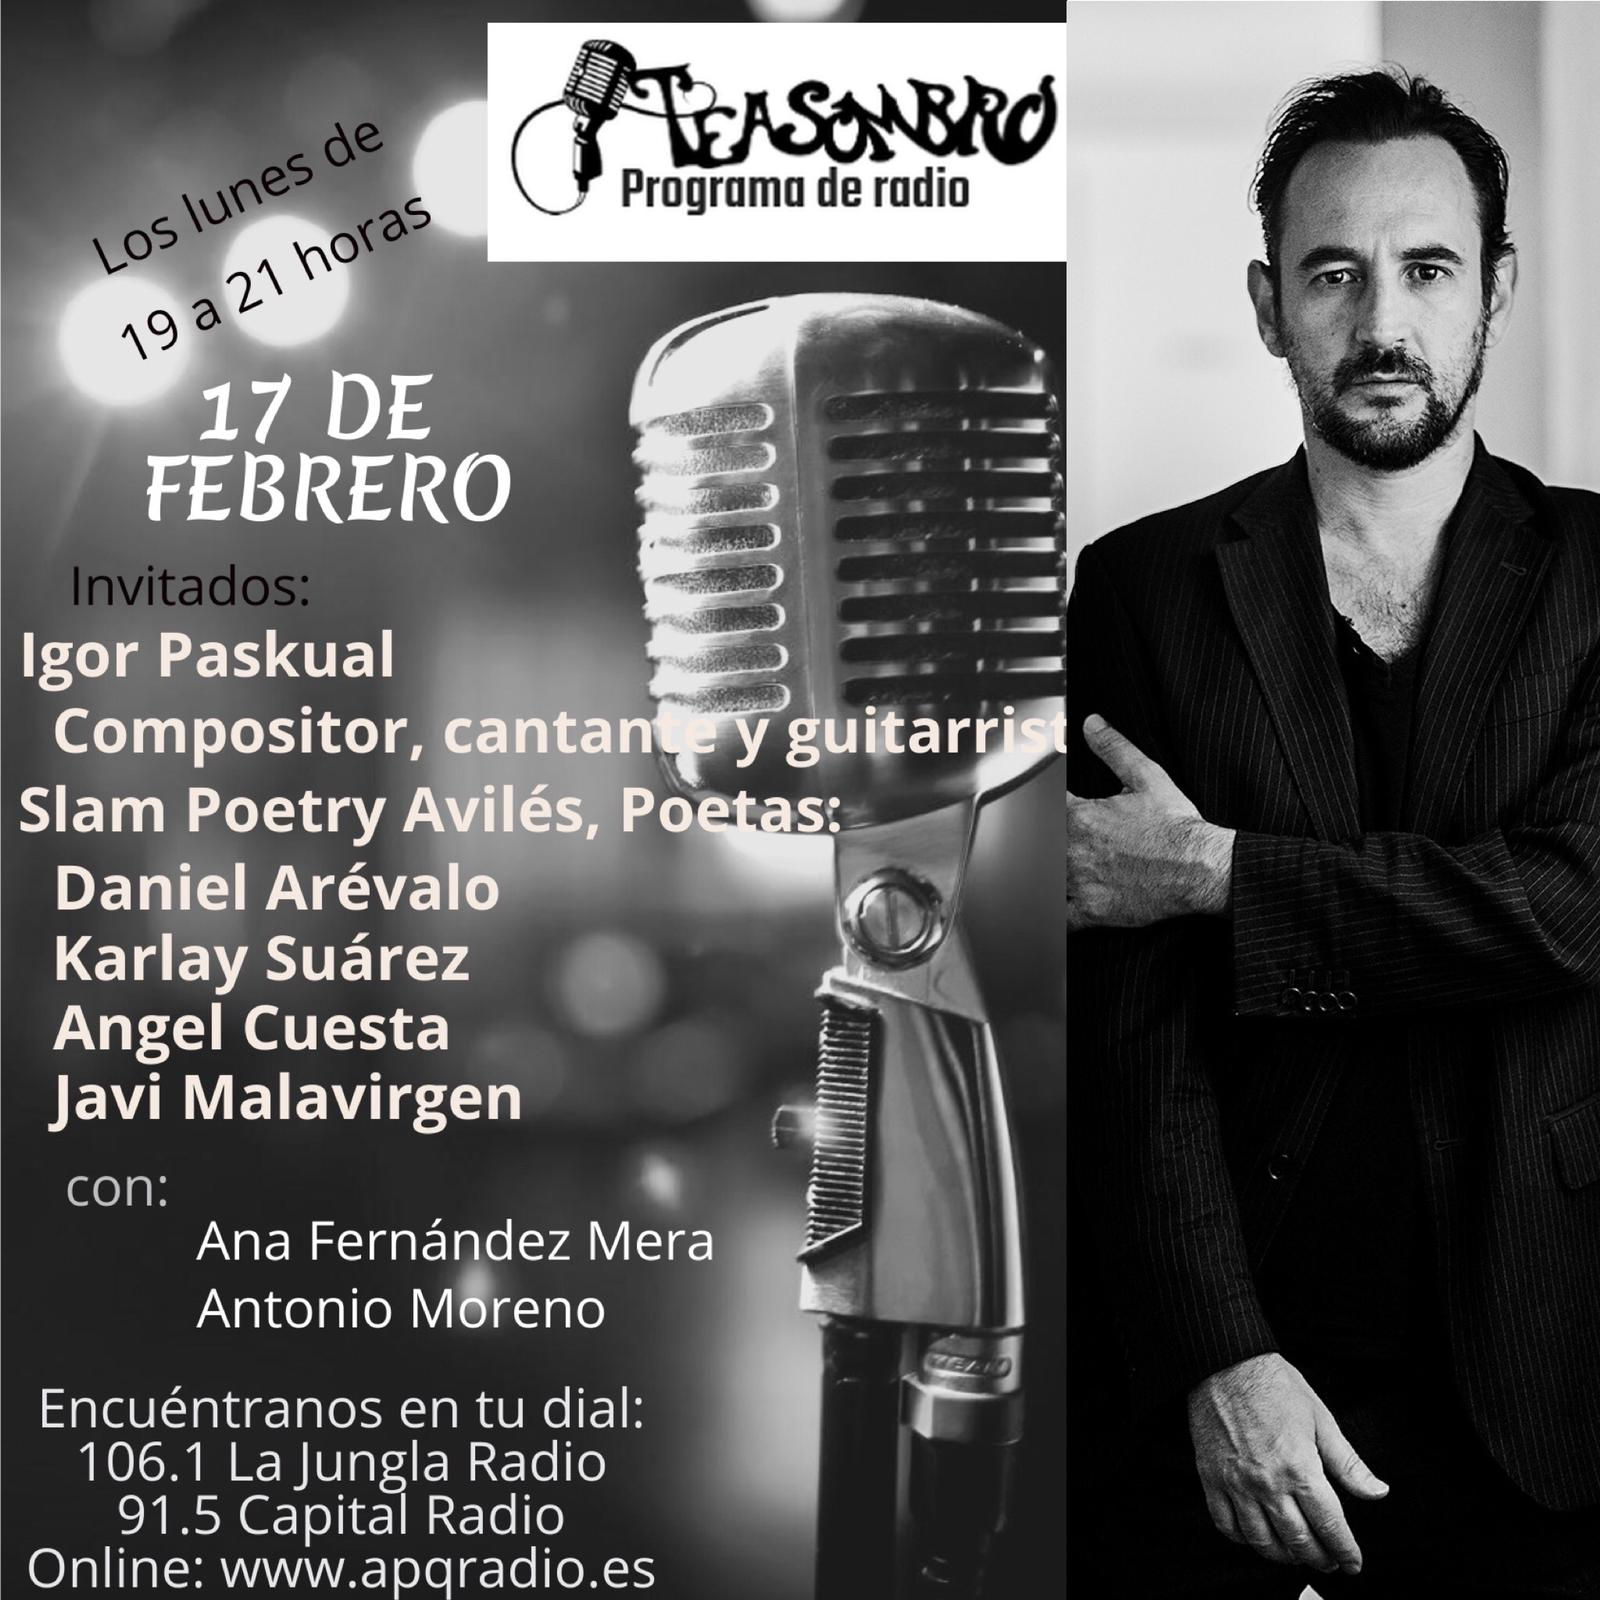 Cartel Programa Teasombro Radio 17 de Febrero